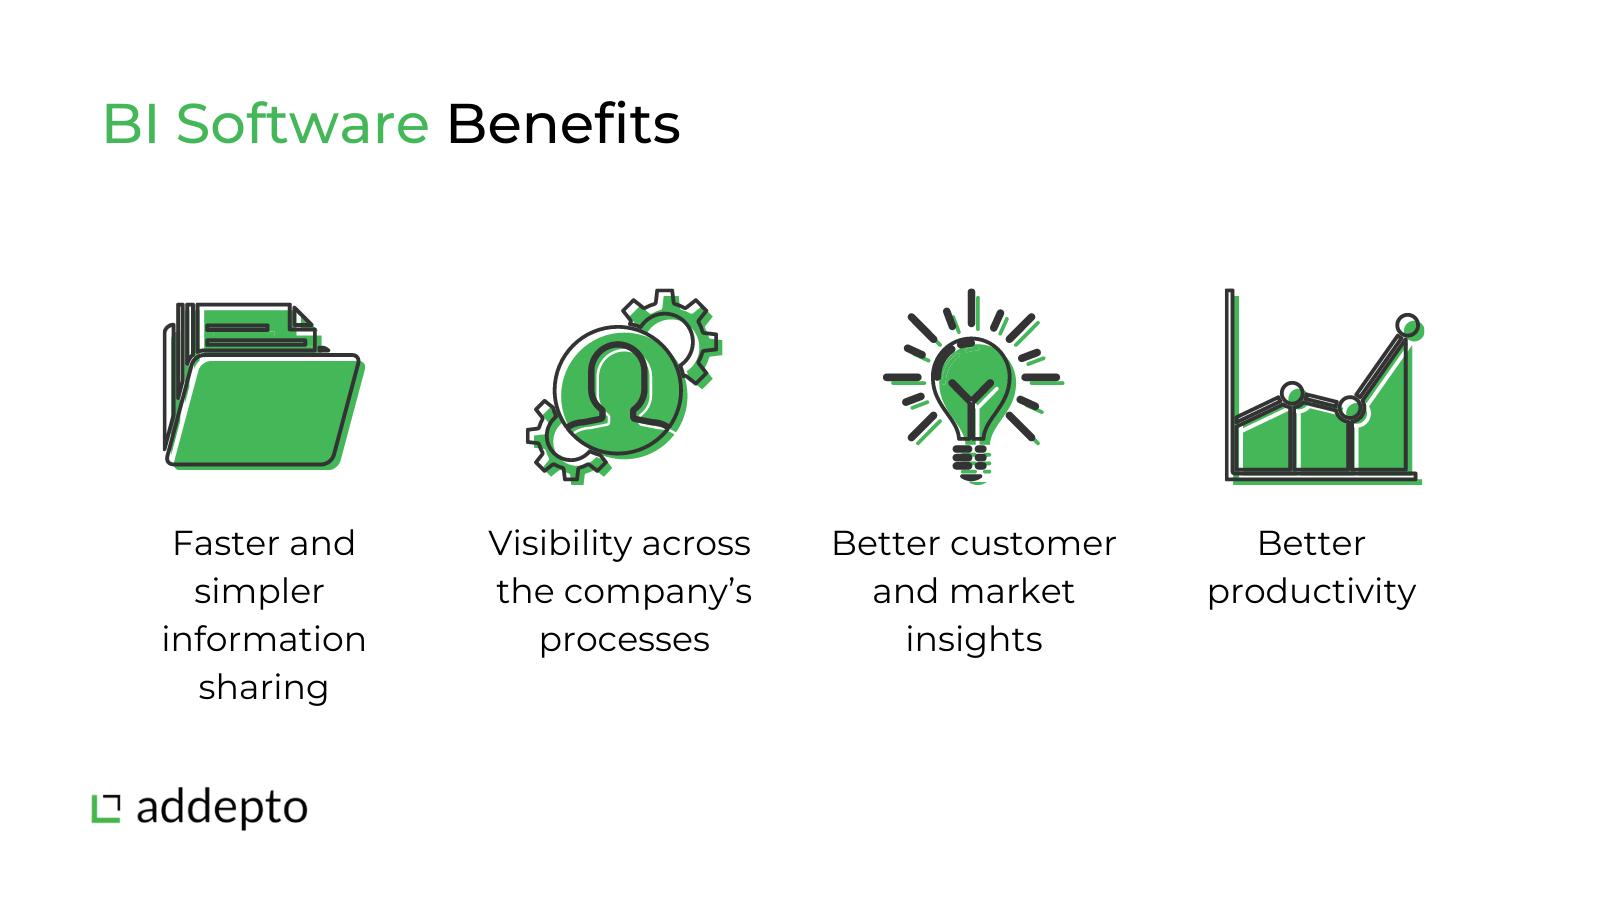 BI software benefits